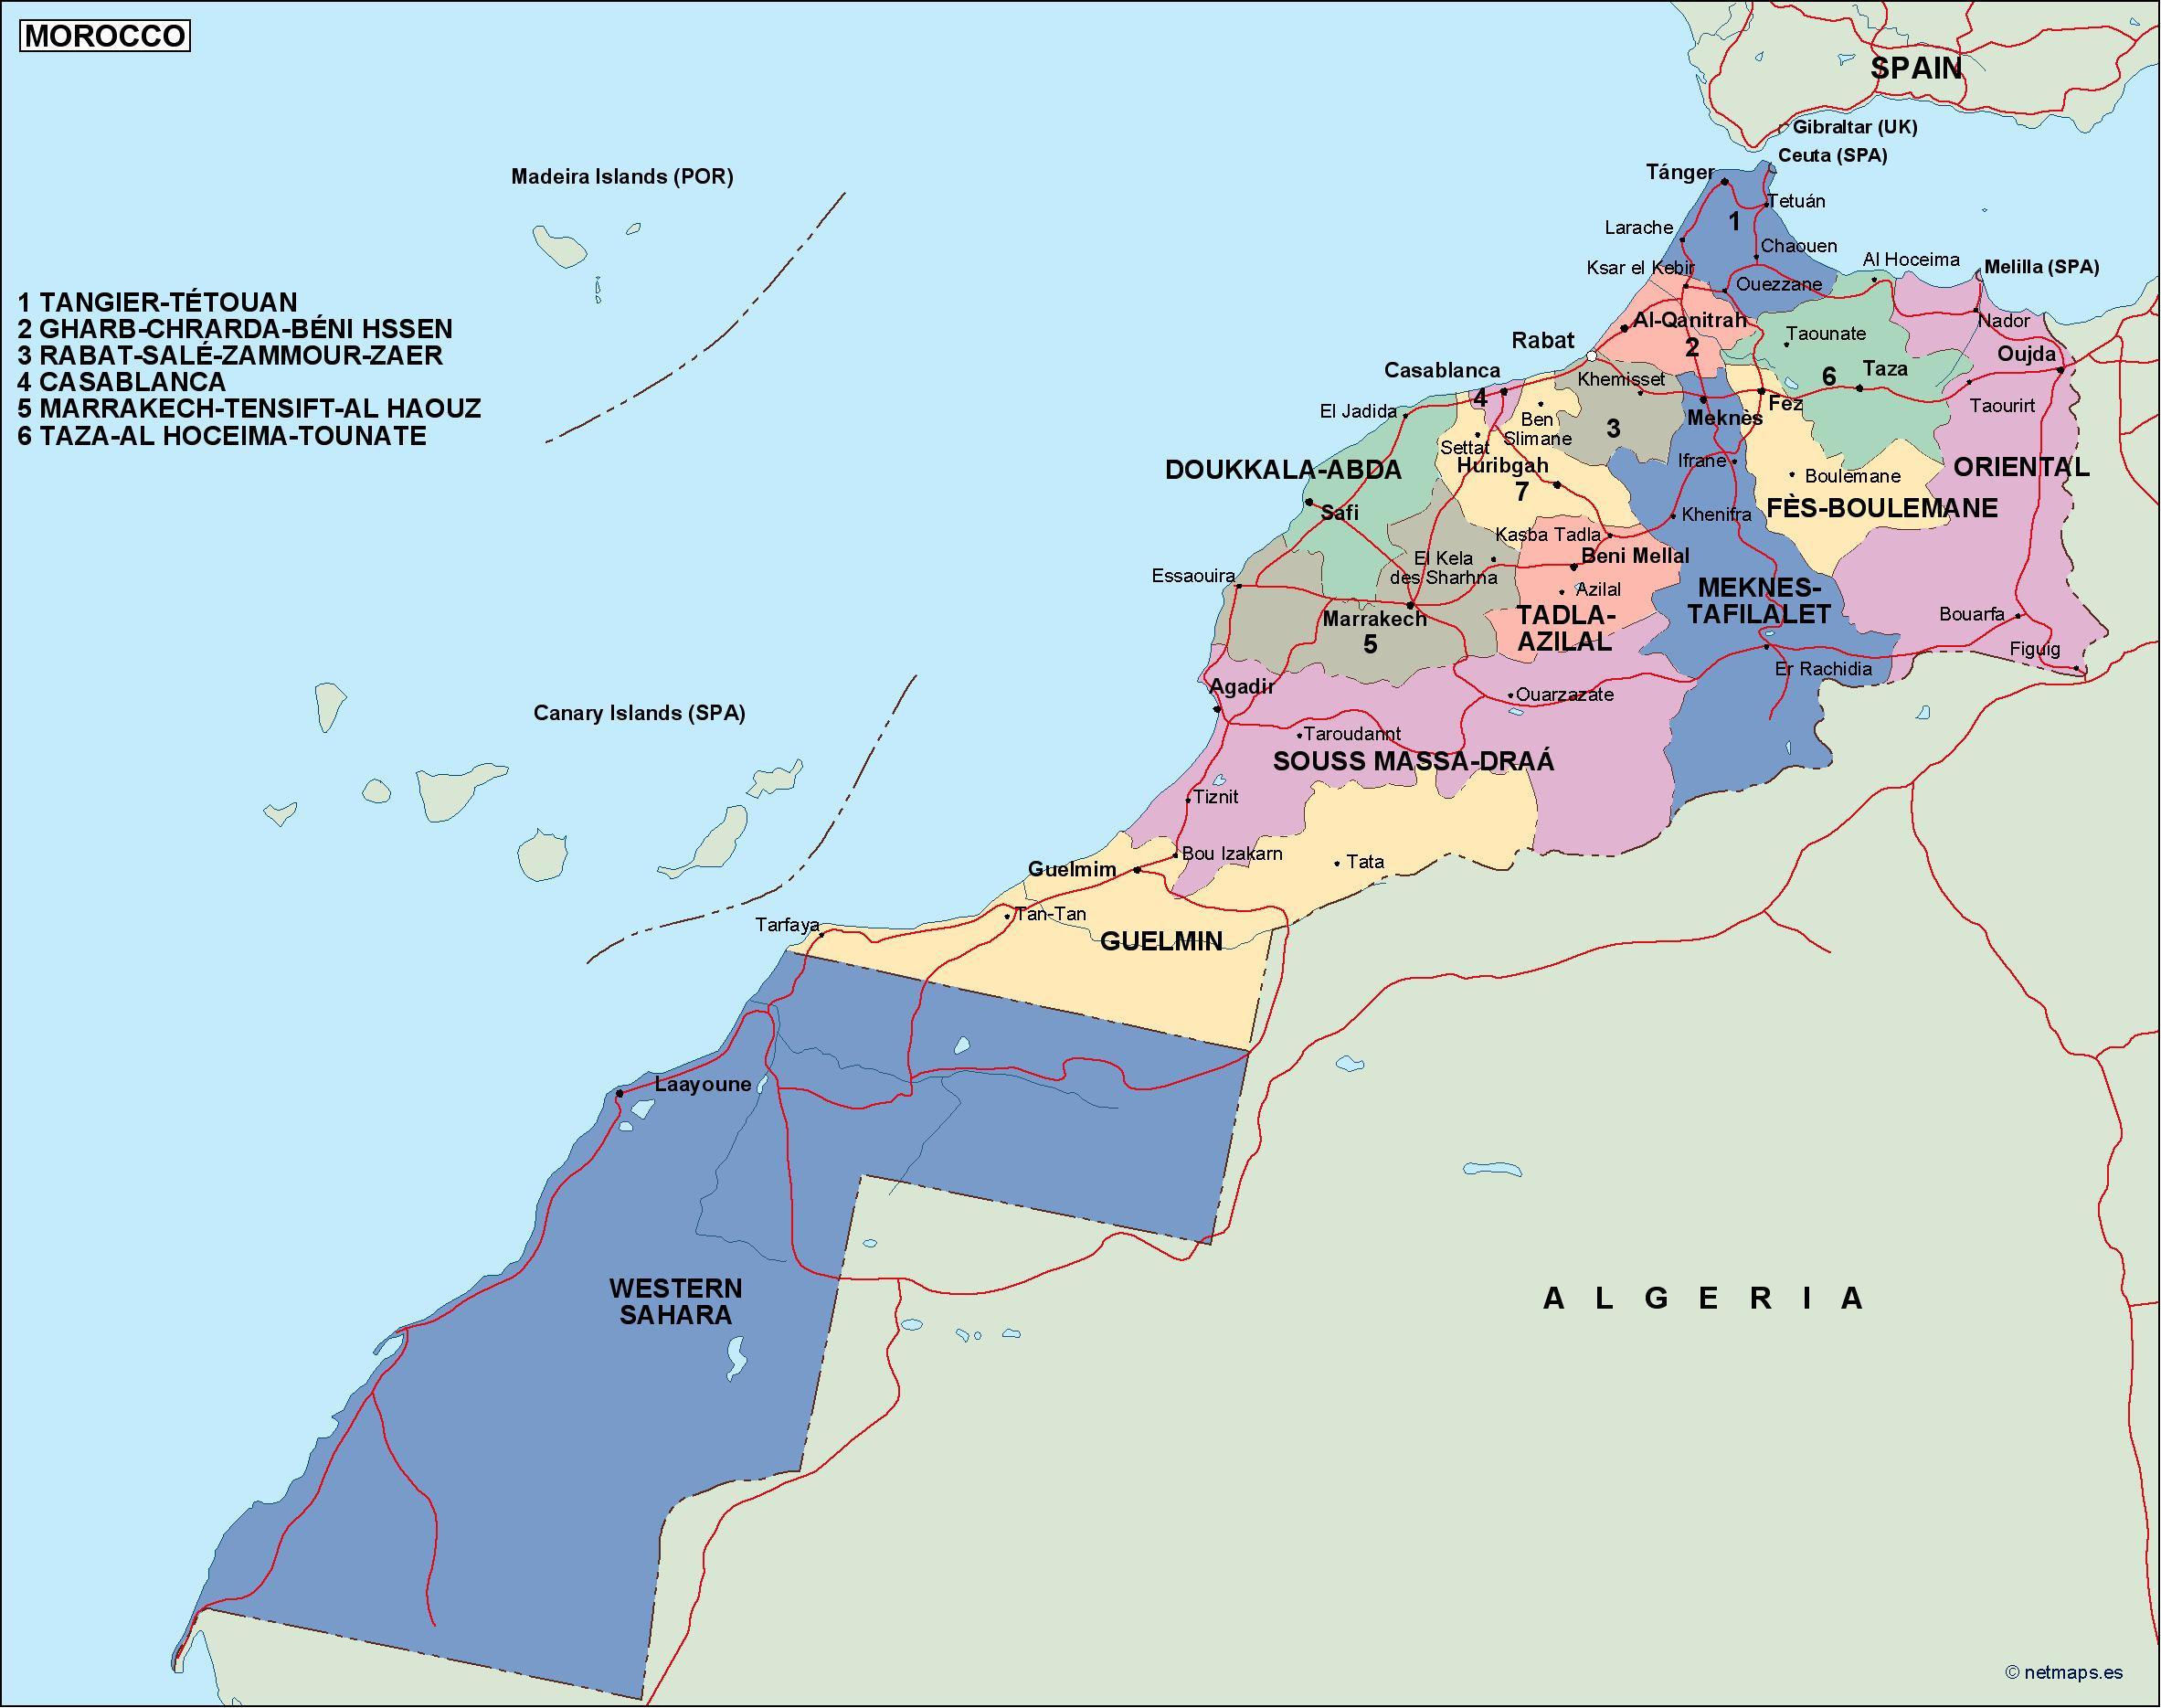 morocco political map on johannesburg map, key largo map, algeria map, timbuktu map, potsdam map, dubai map, morocco map, tripoli map, western sahara map, marrakesh map, marrakech map, africa map, algiers map, dar es salaam map, cape town map, damascus map, accra map, salerno map, oran map, lima map,